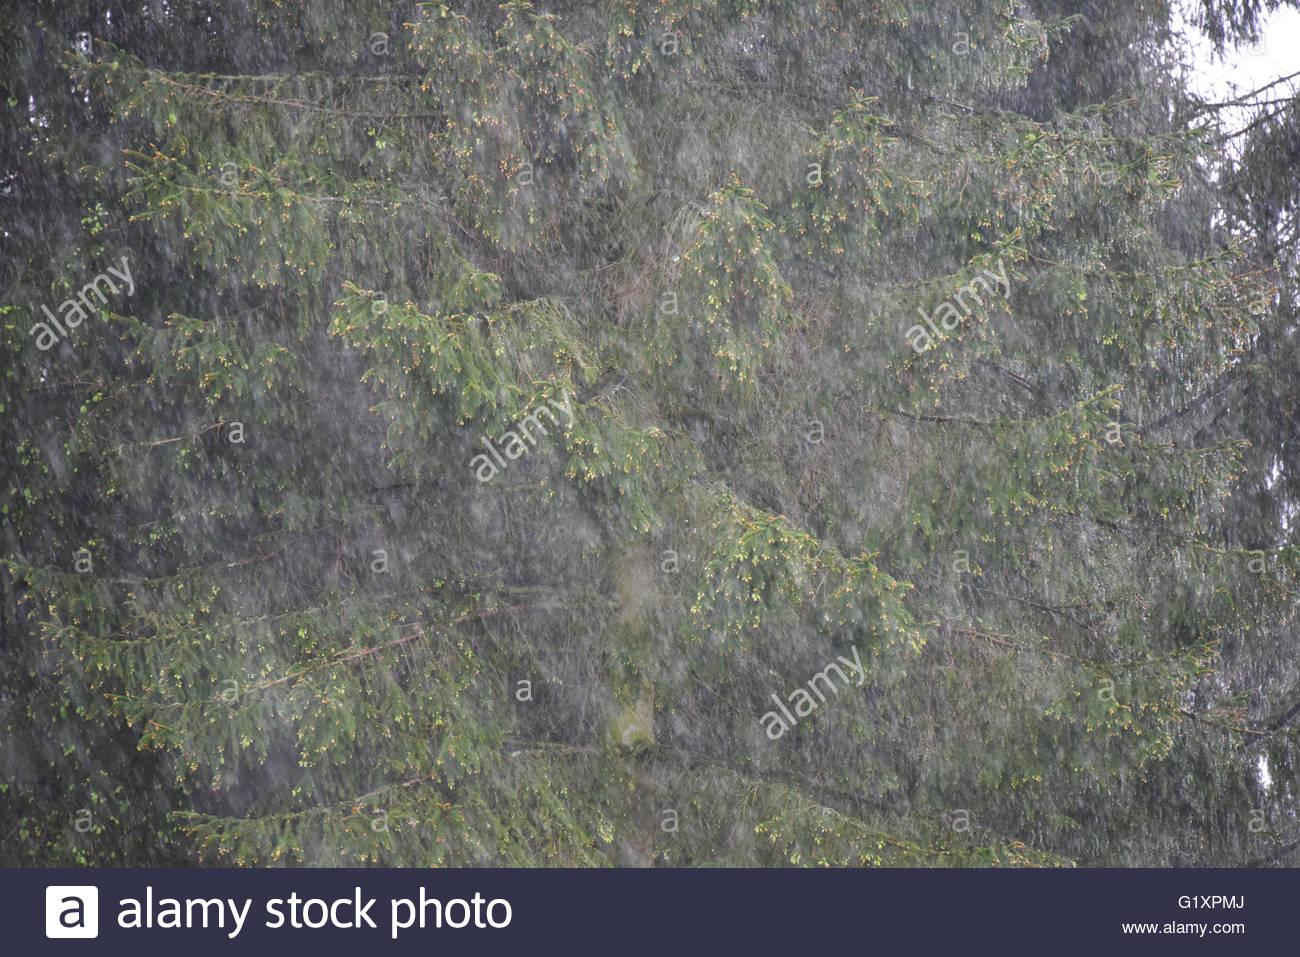 Las lluvias torrenciales caídas en bosques siempreverdes en el sur de Shropshire Imagen De Stock